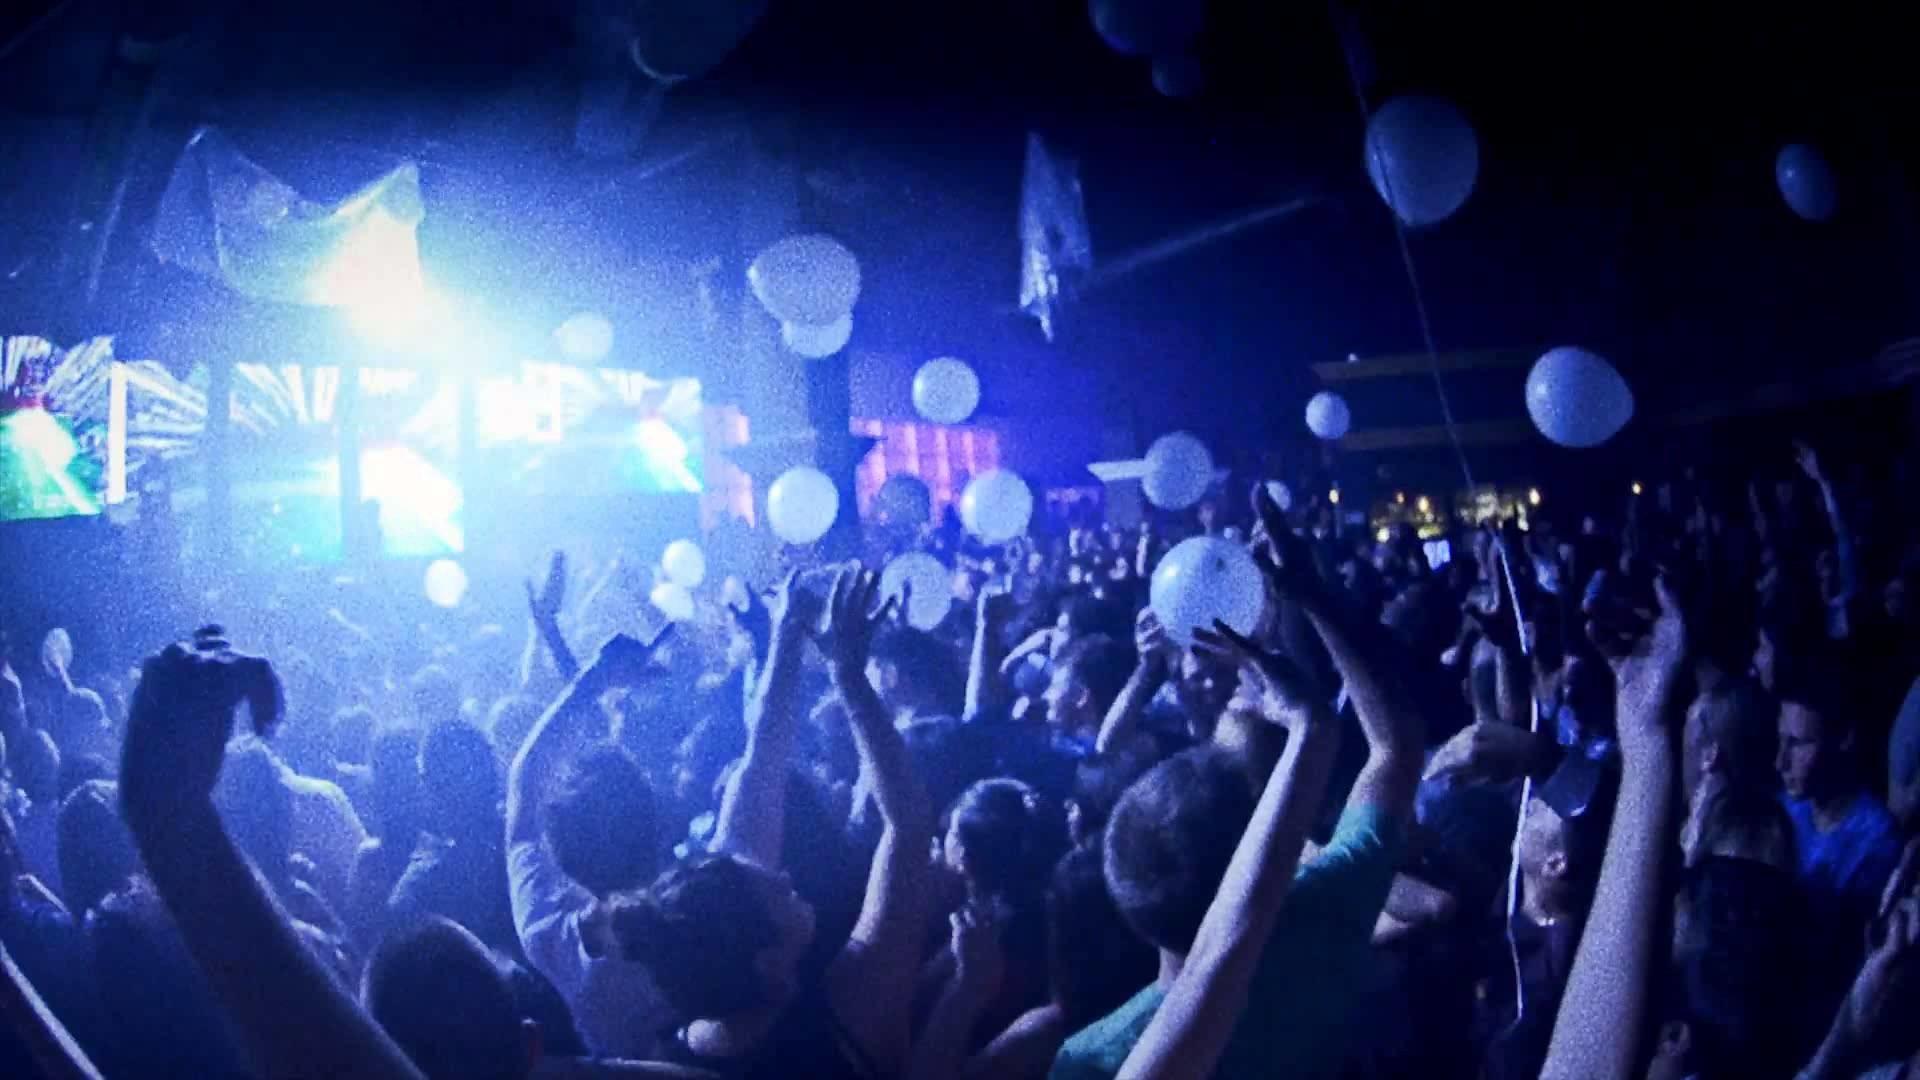 night club wallpapers ·①